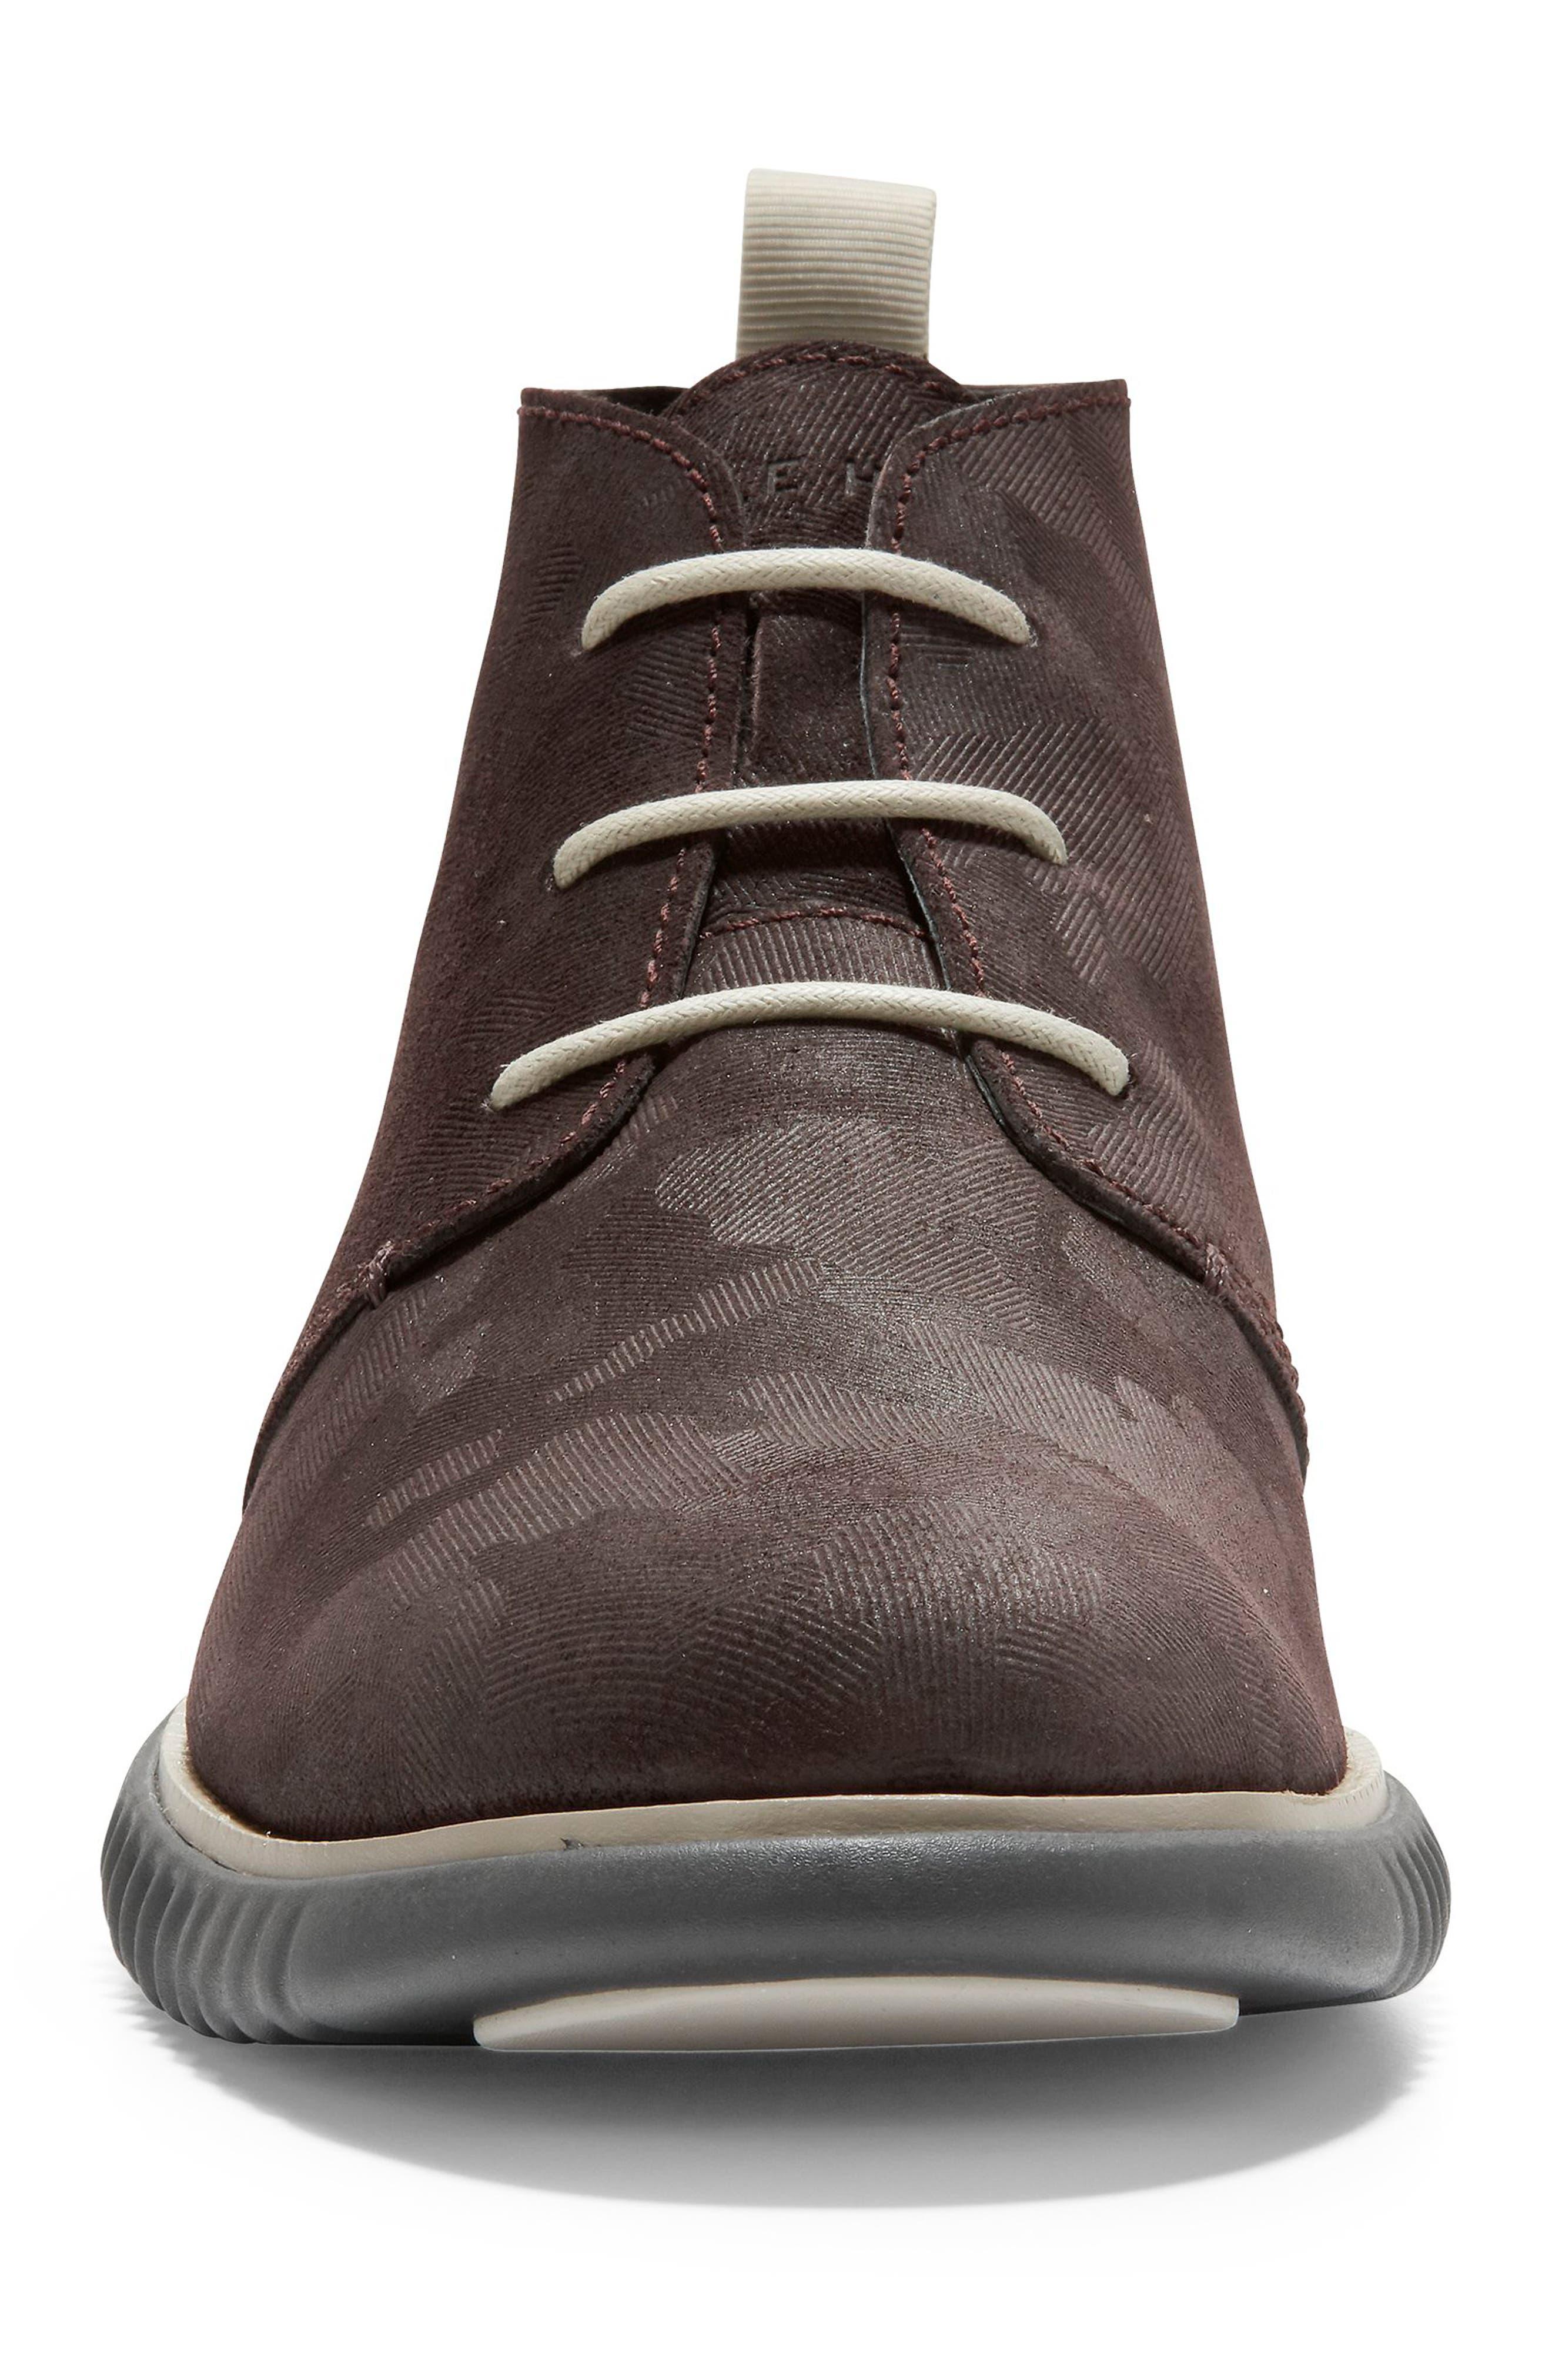 2.Zerogrand Chukka Boot,                             Alternate thumbnail 4, color,                             BLACK/ WALNUT SUEDE